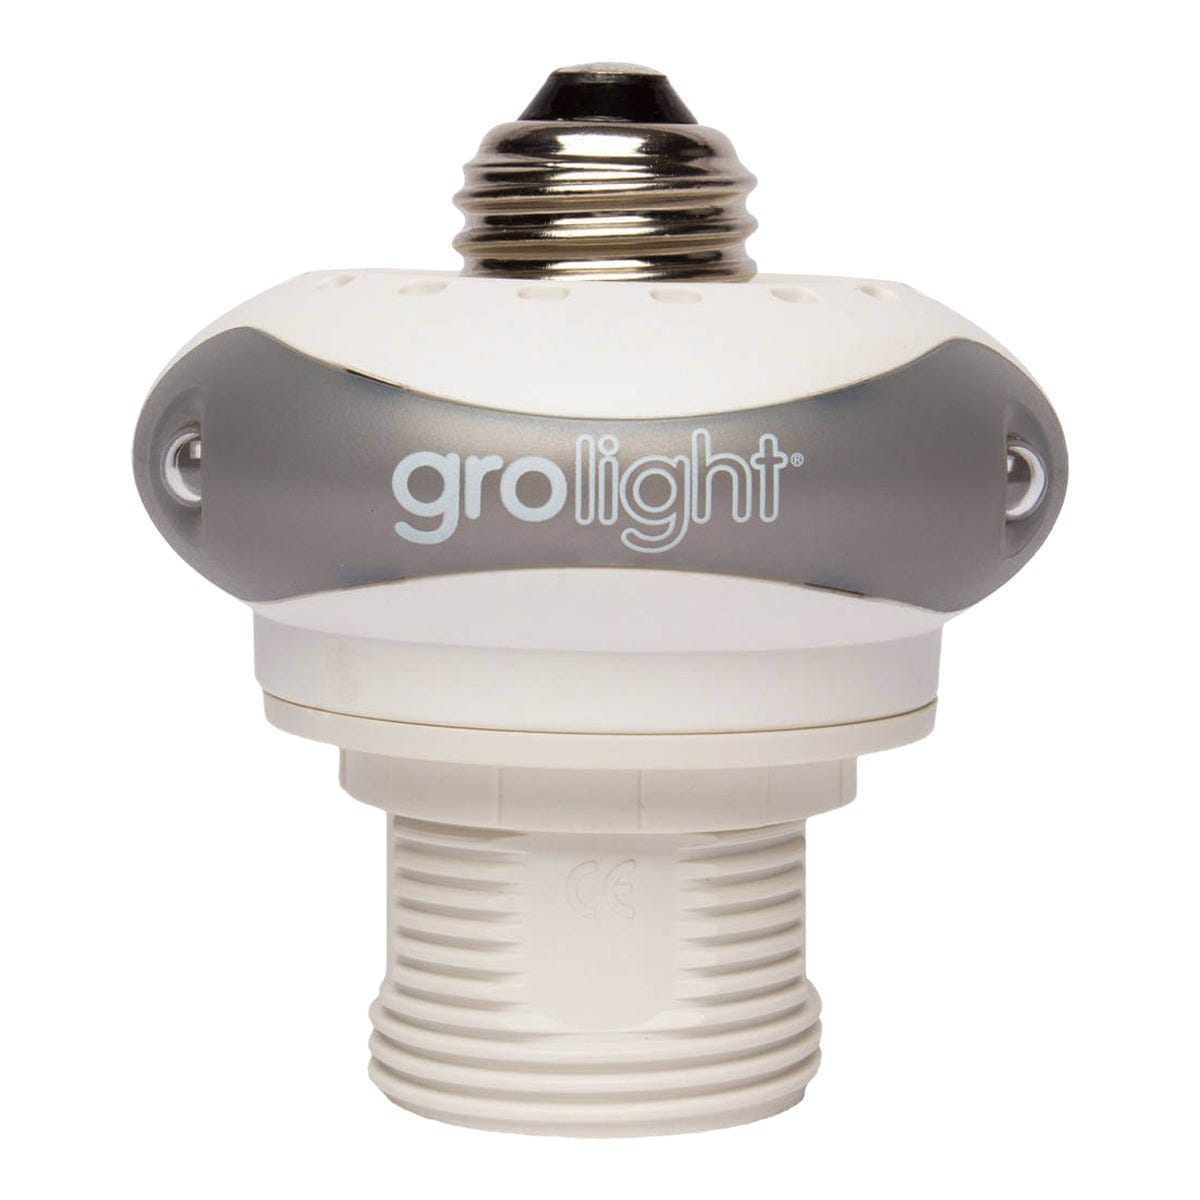 Grolight Edison screw fit